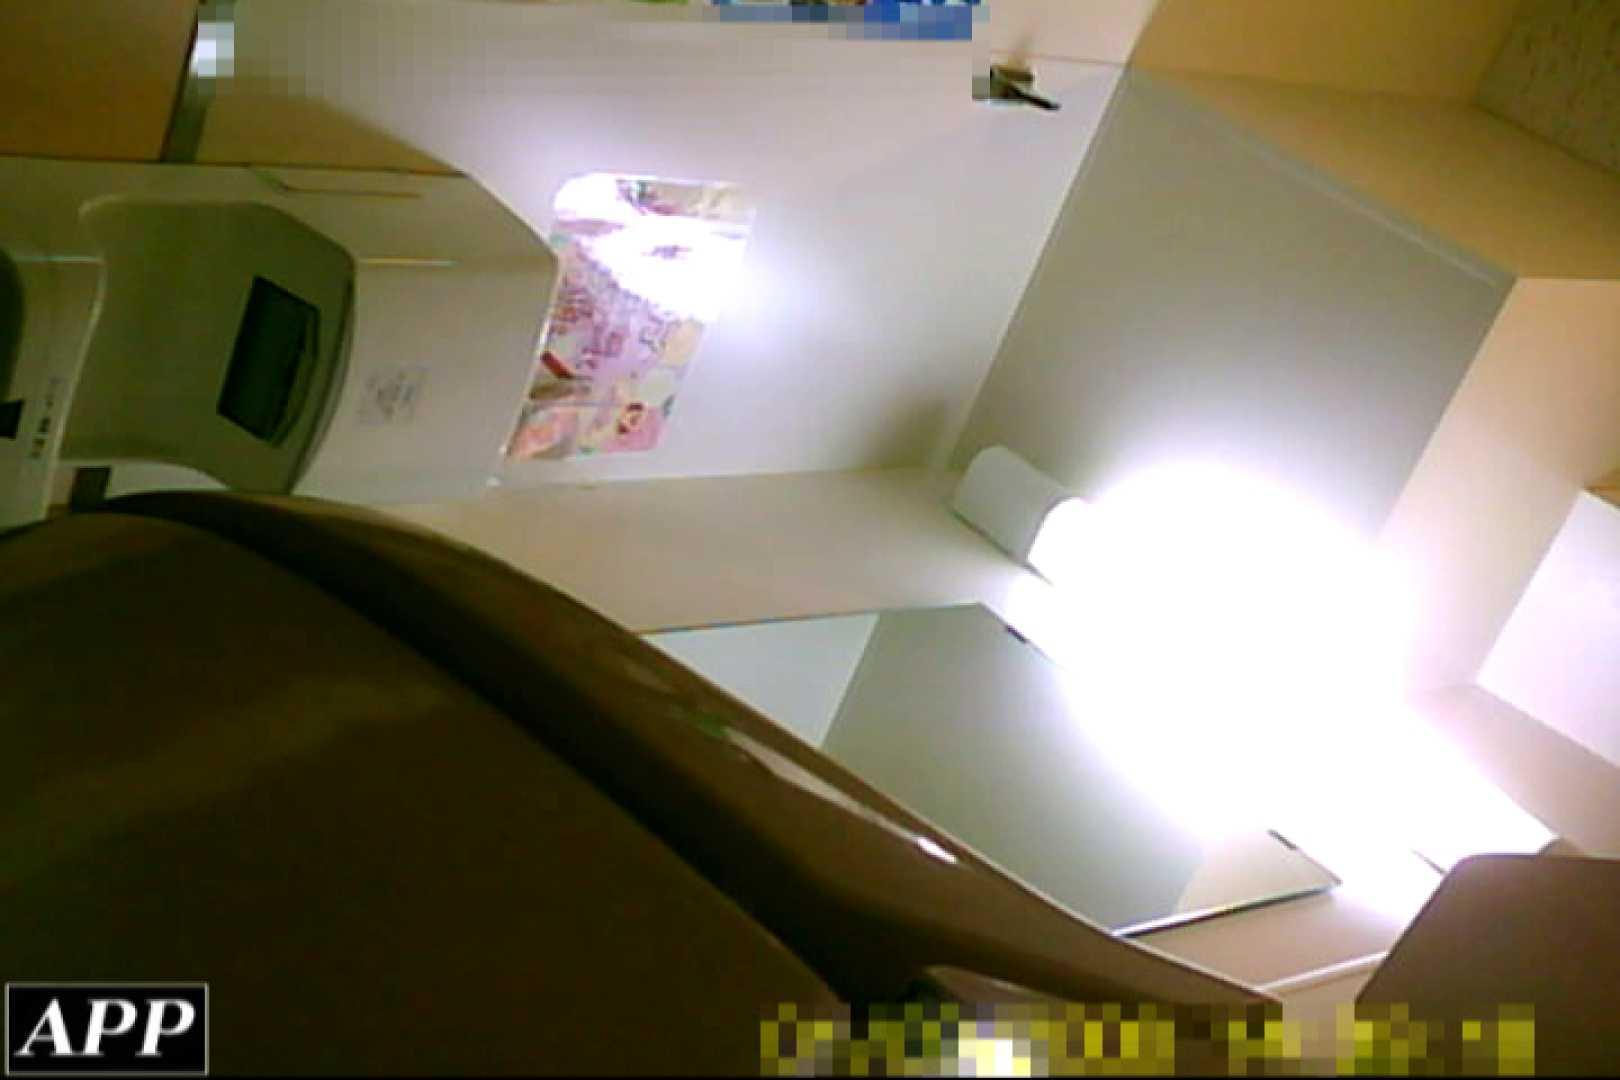 3視点洗面所 vol.23 マンコ | 洗面所  15画像 14